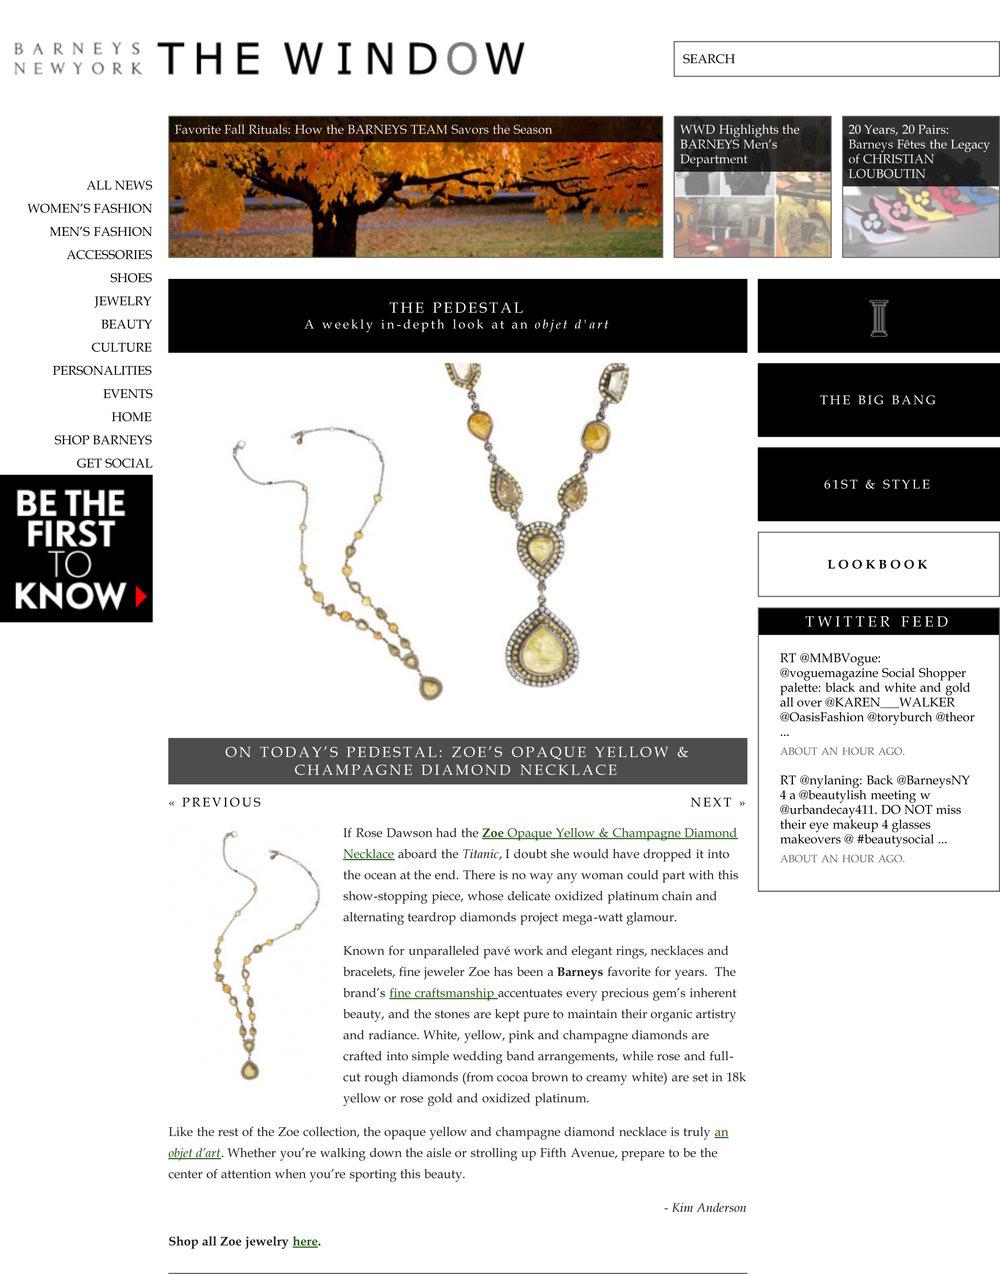 ZOE's Opaque Yellow & Champagne Diamond Necklace | Barneys New York The Window-1.jpeg